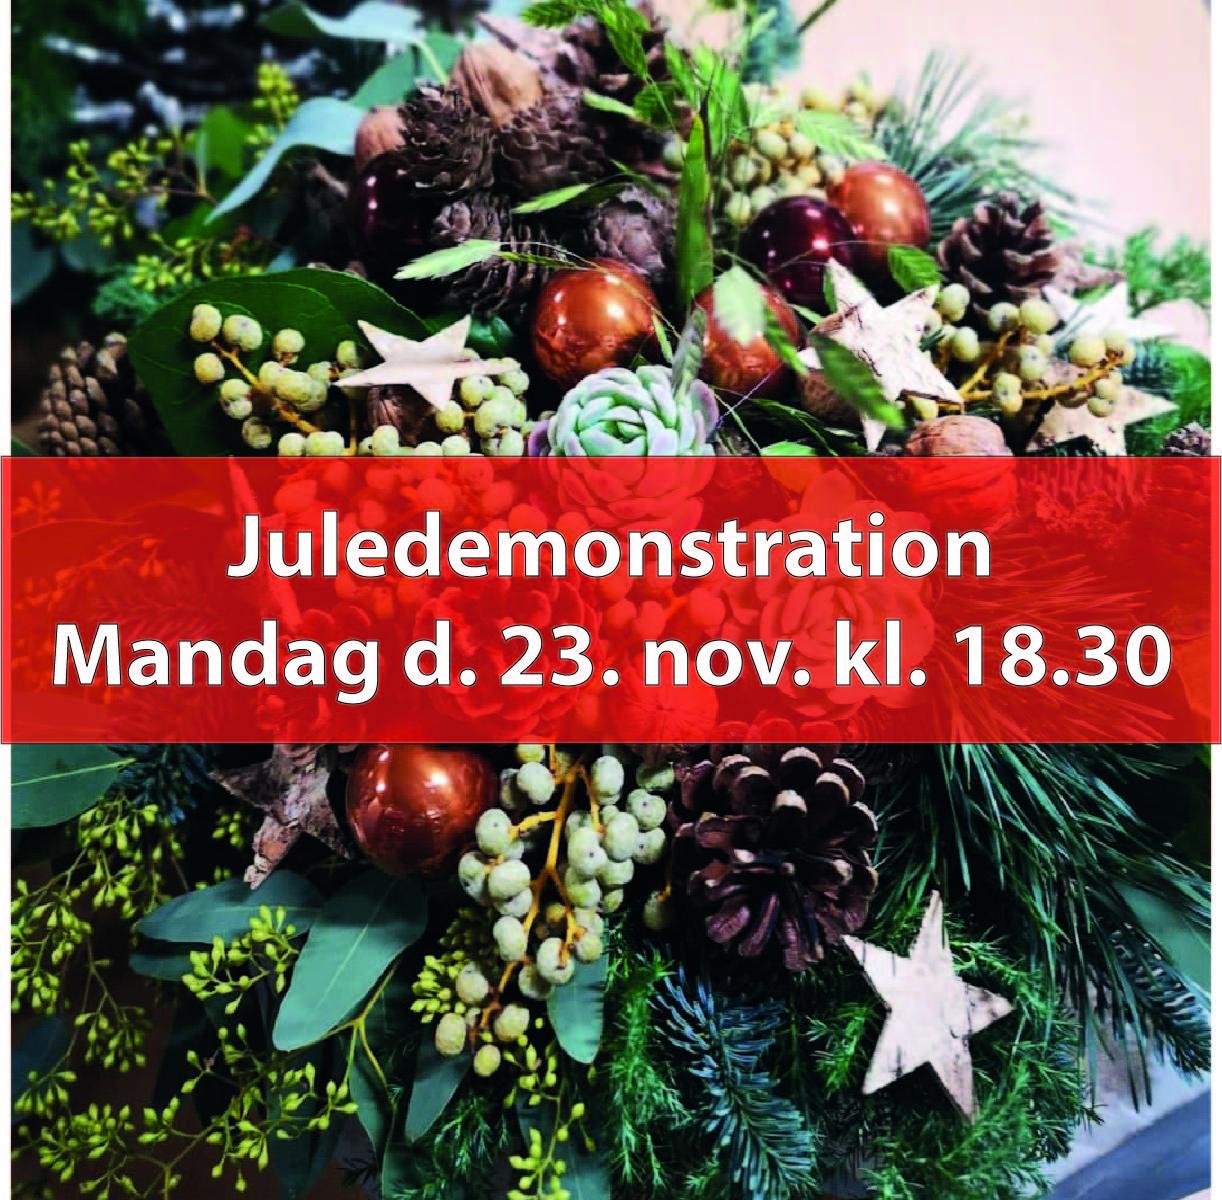 Juledemonstration, Man. den 23. nov. kl. 18.30